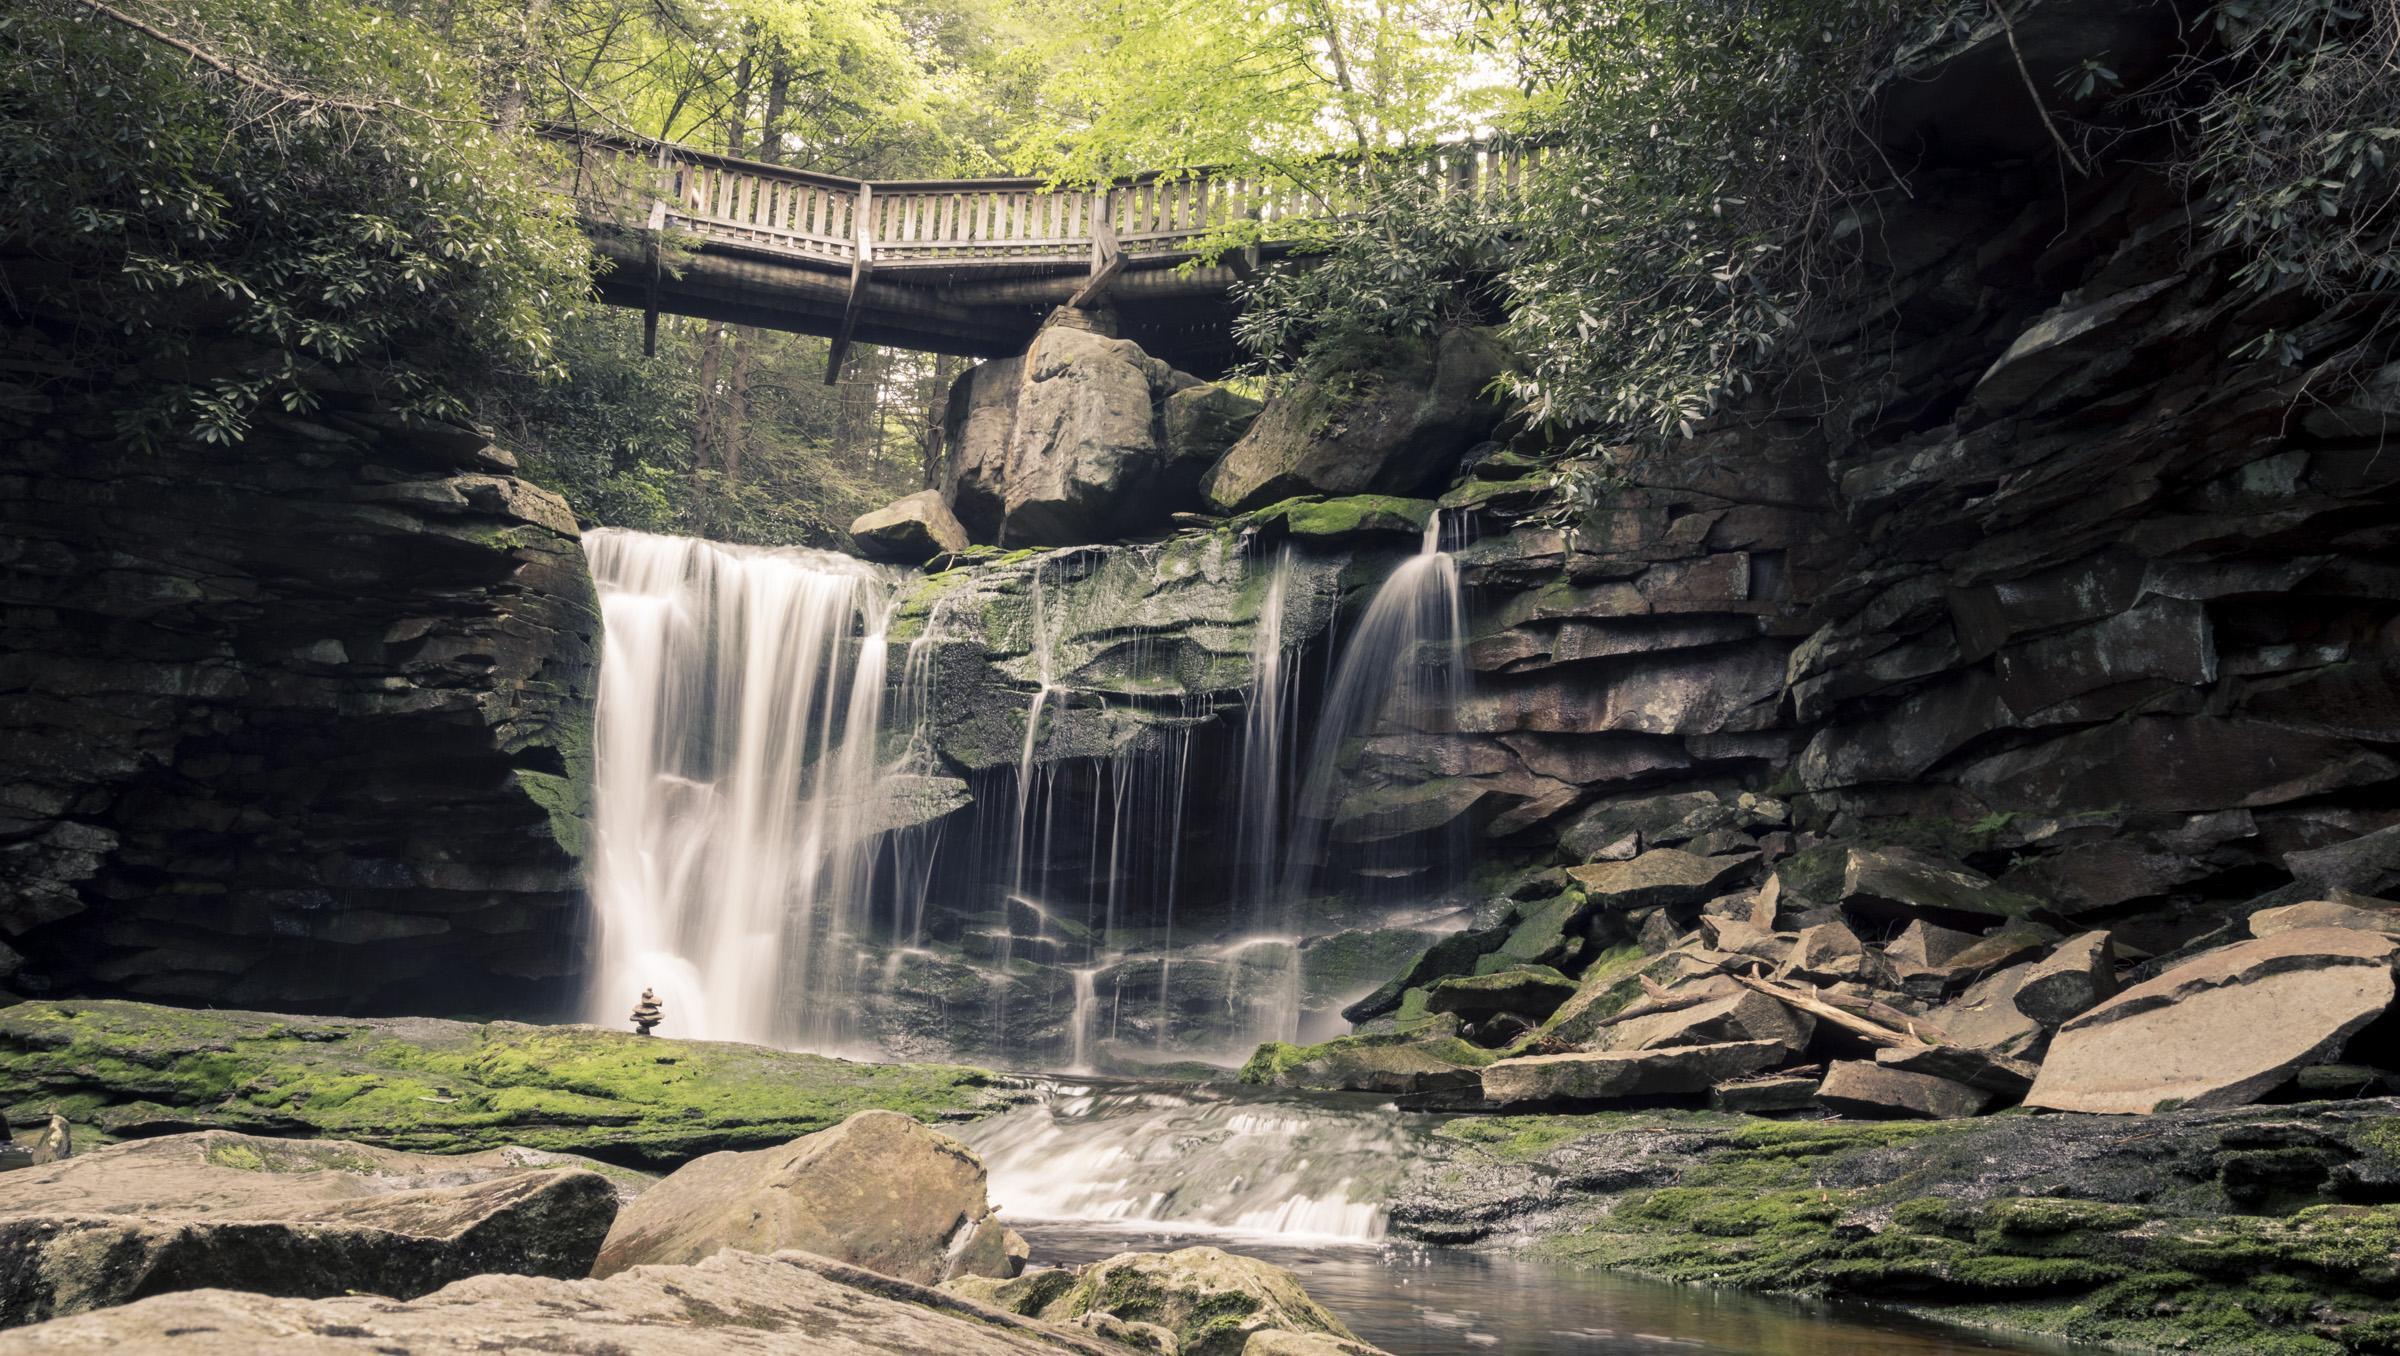 The first of the cascades at Elakala Falls.